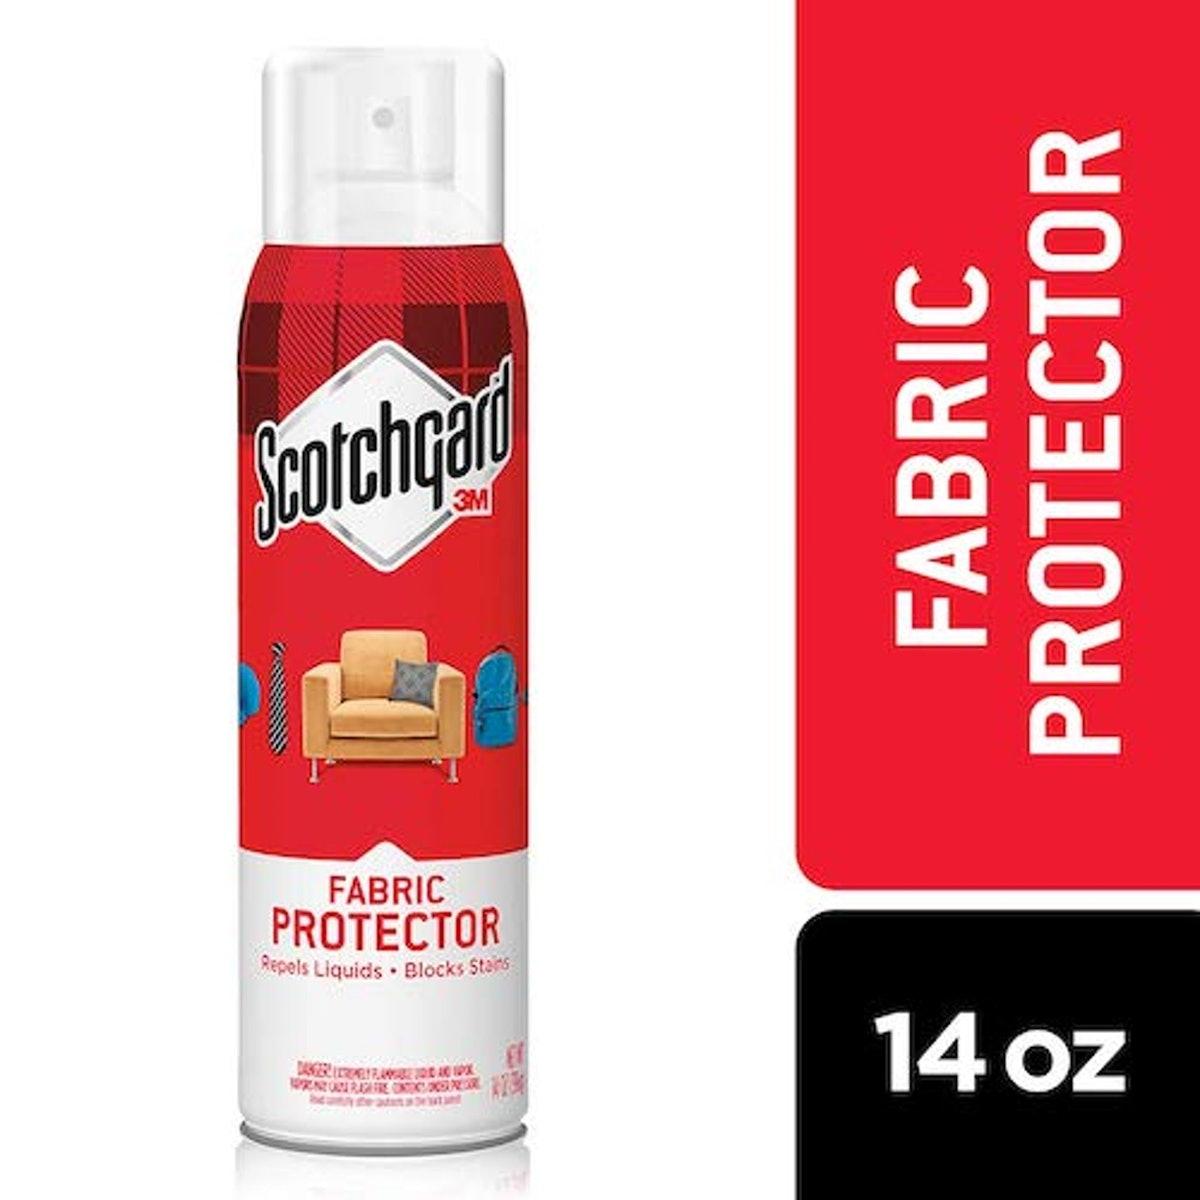 Scotchgard Fabric & Upholstery Protector